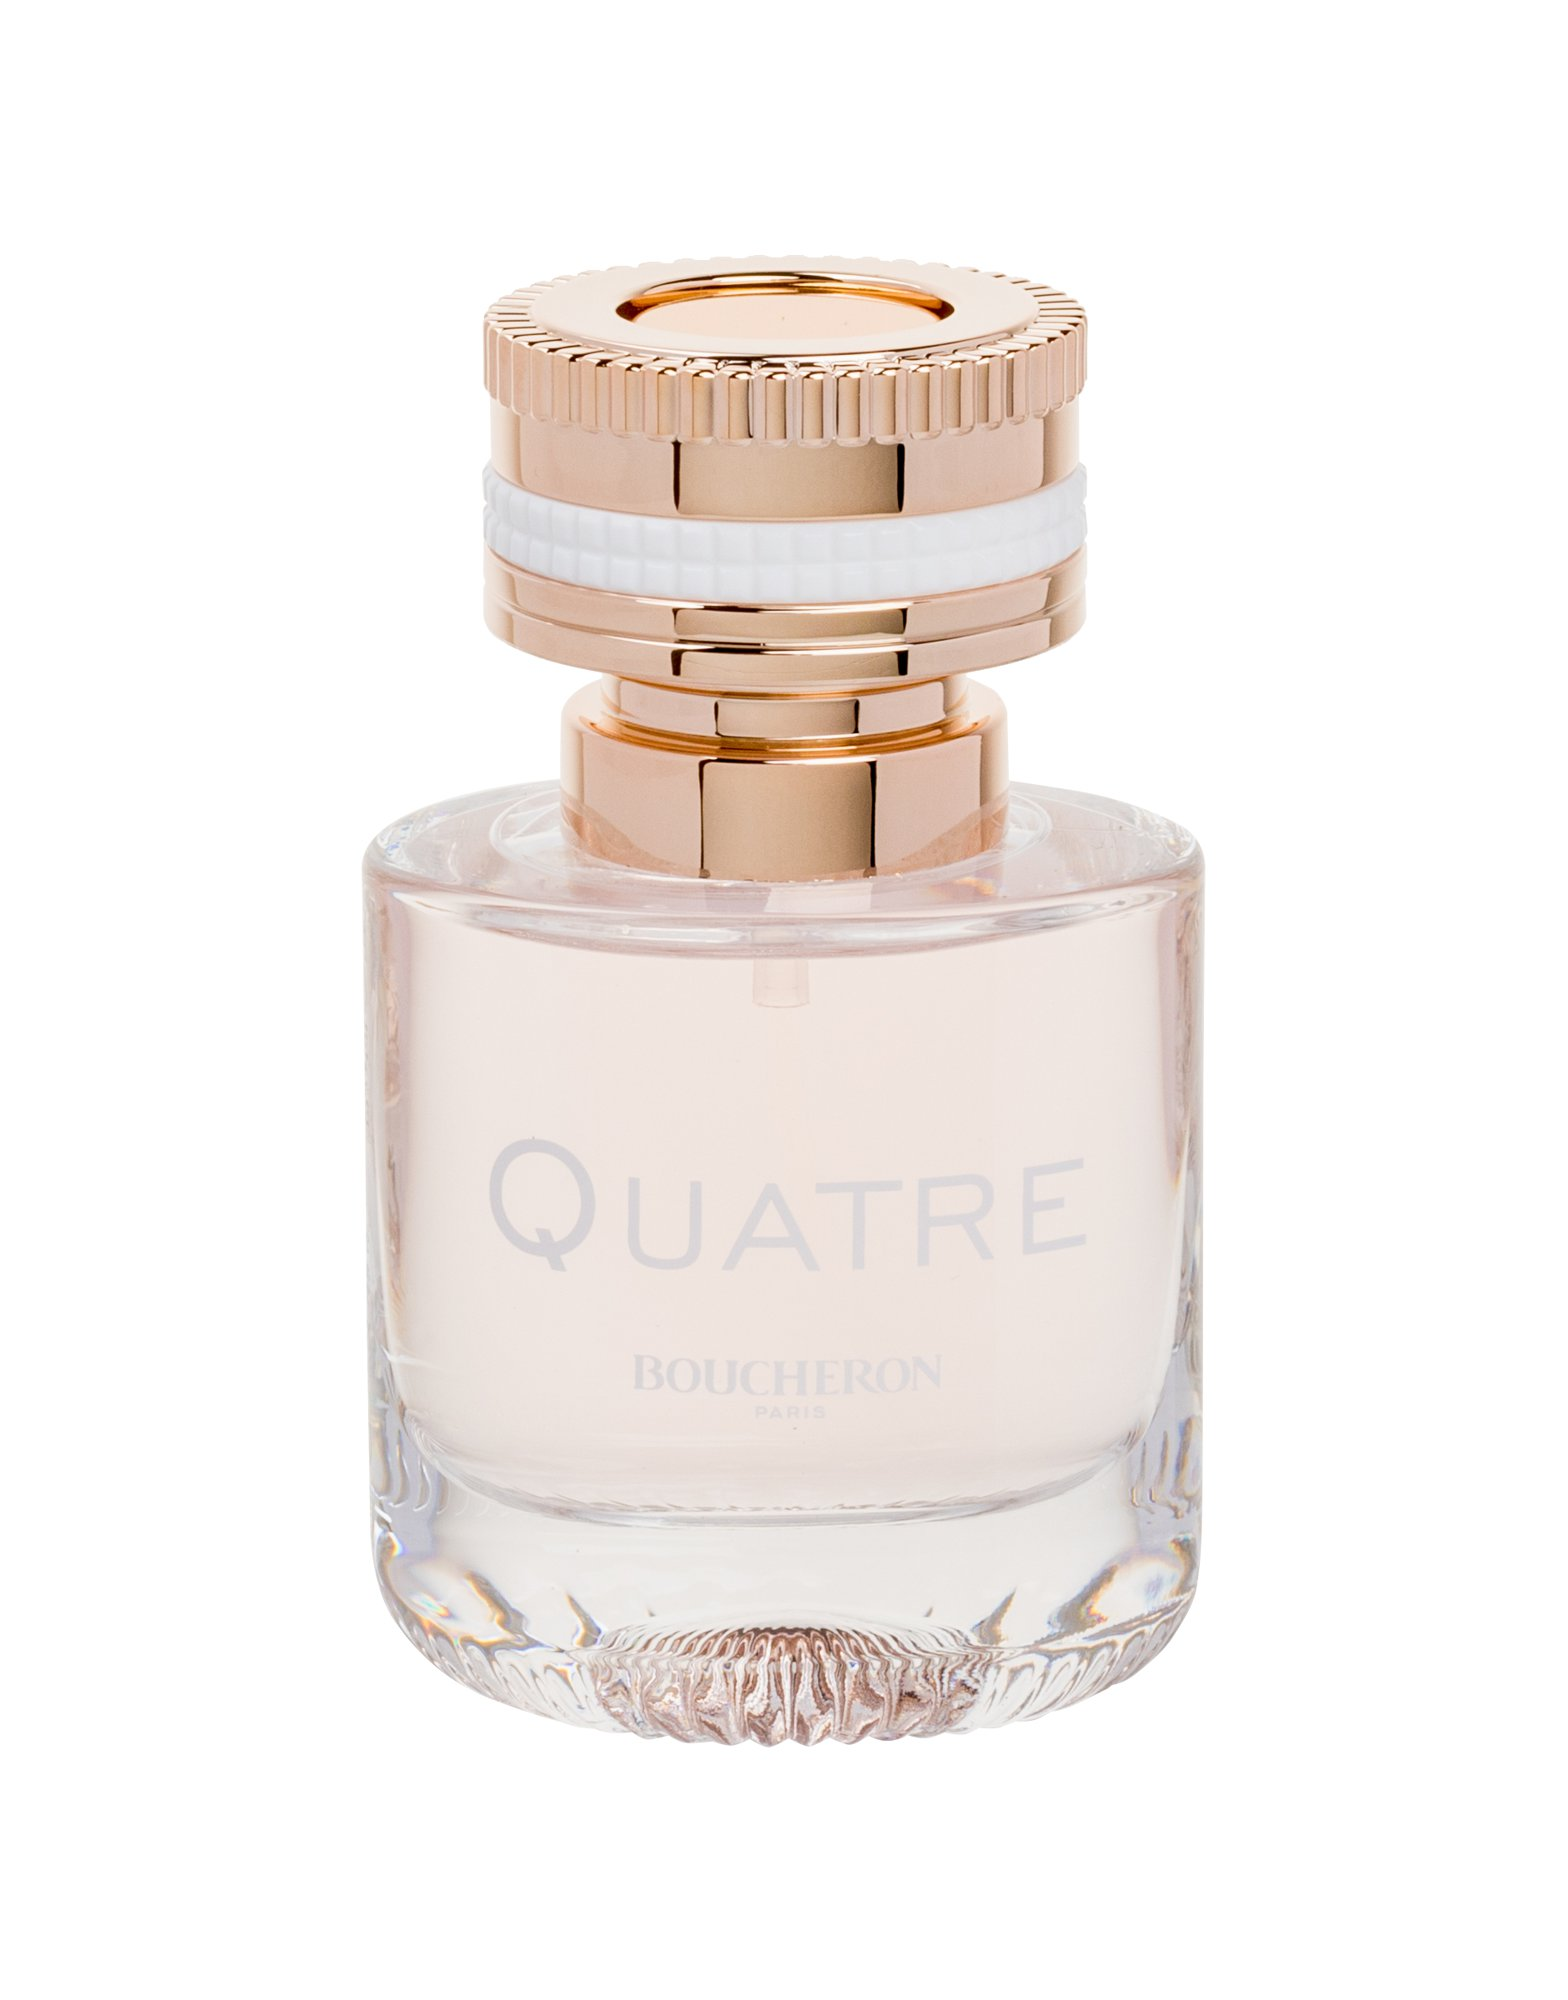 Boucheron Boucheron Quatre, Parfumovaná voda 30ml